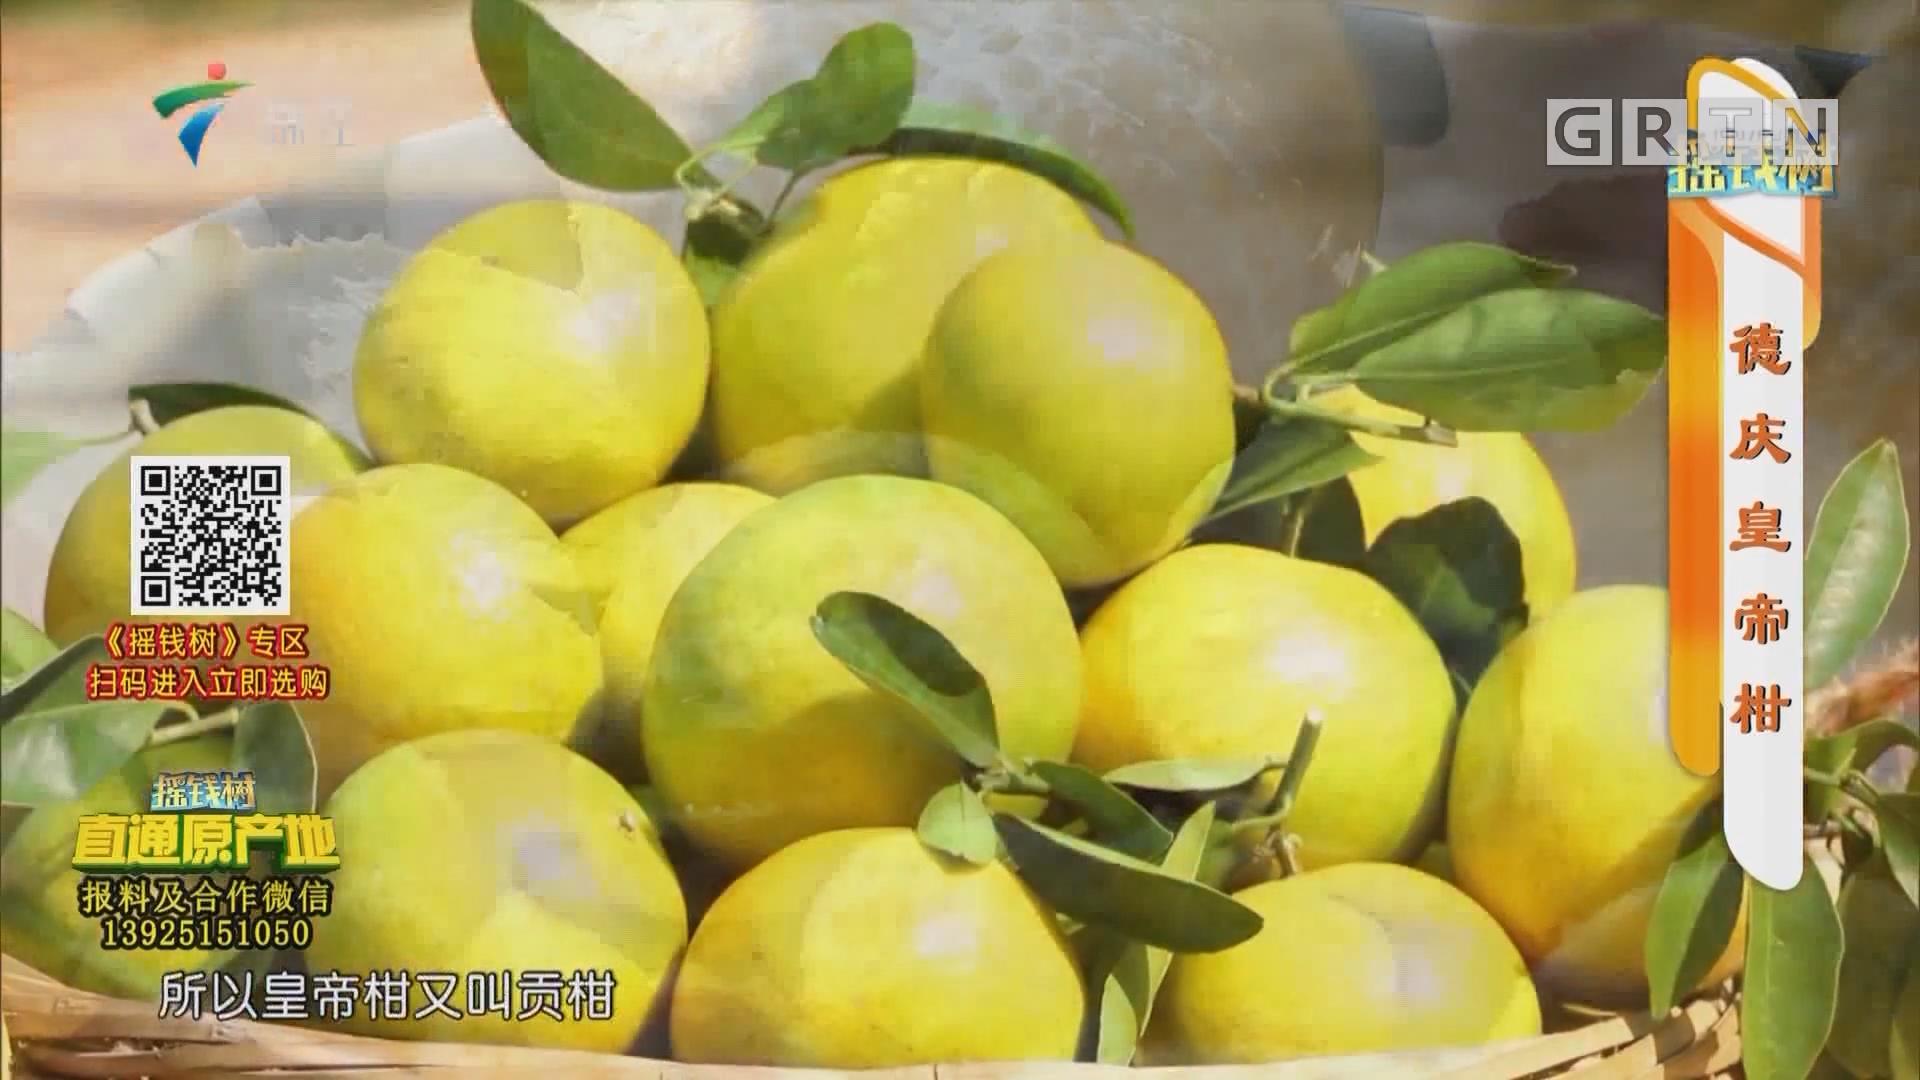 [HD][2019-11-25]摇钱树:德庆皇帝柑